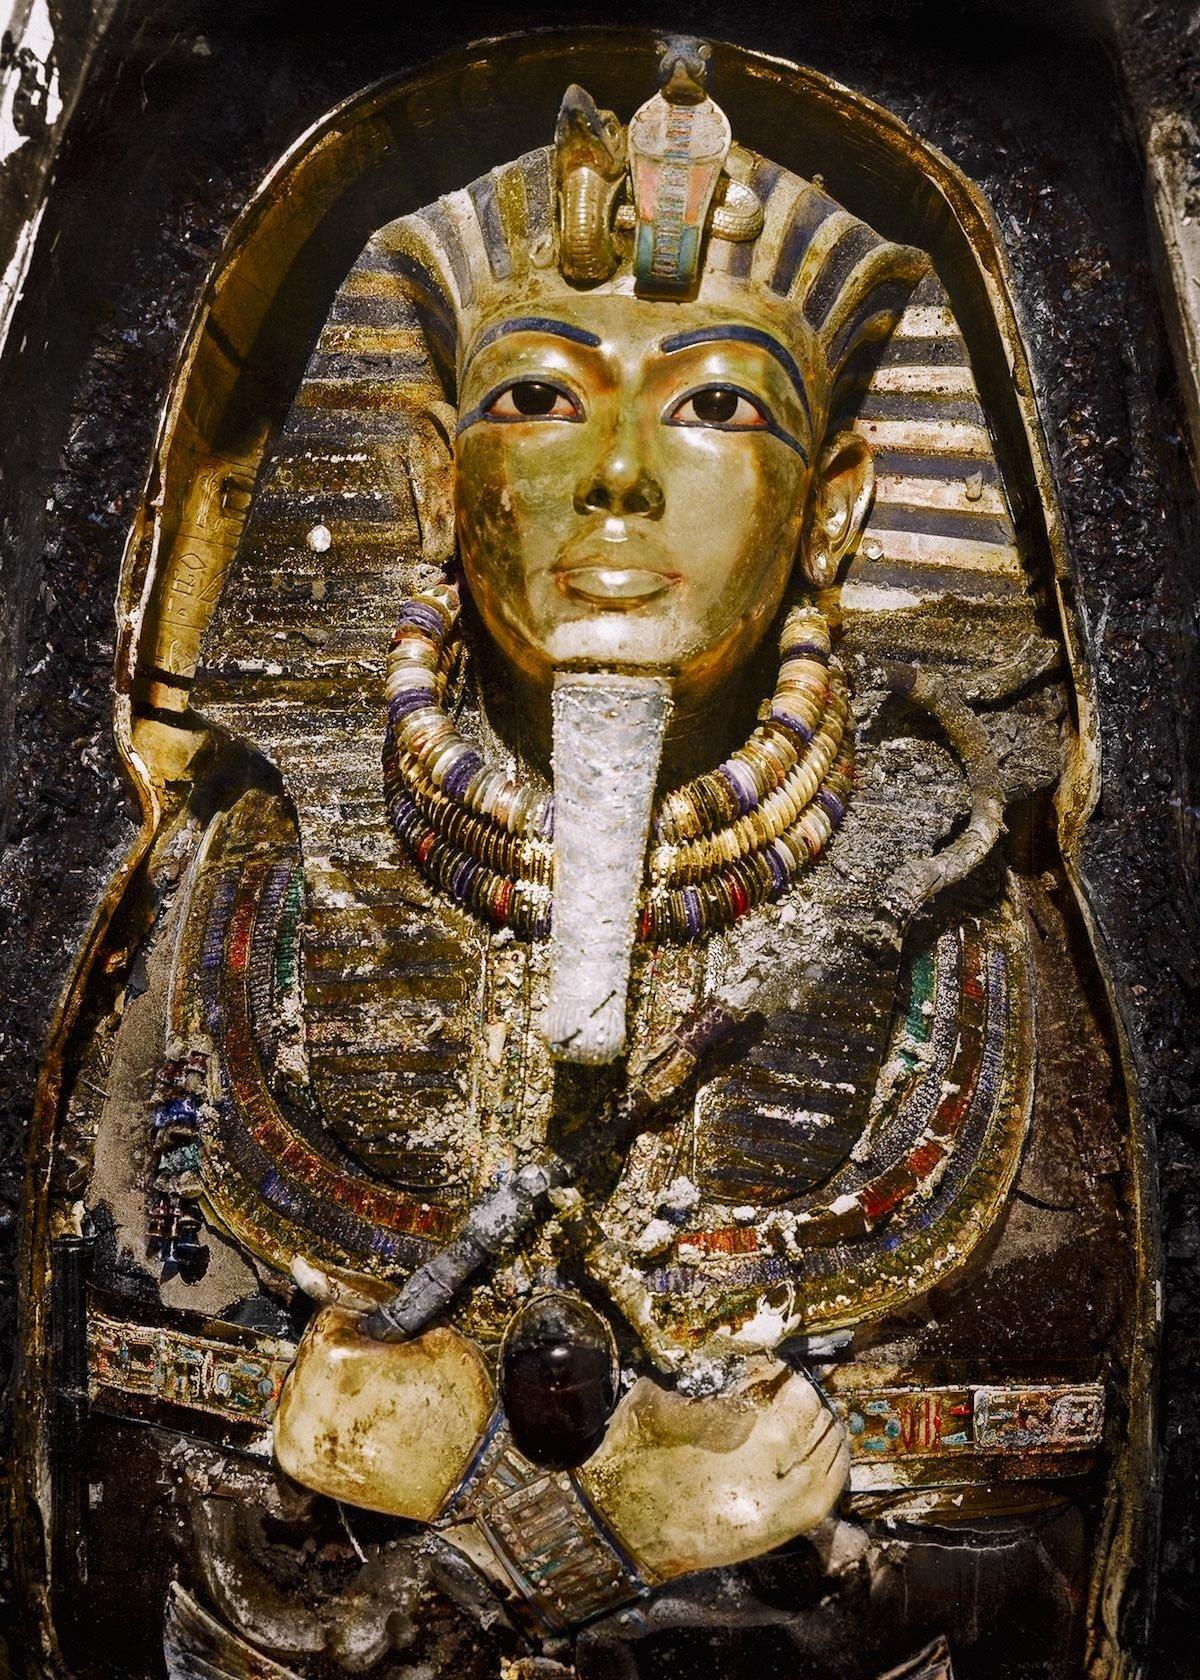 A máscara mortuária do faraó Tutankhamon